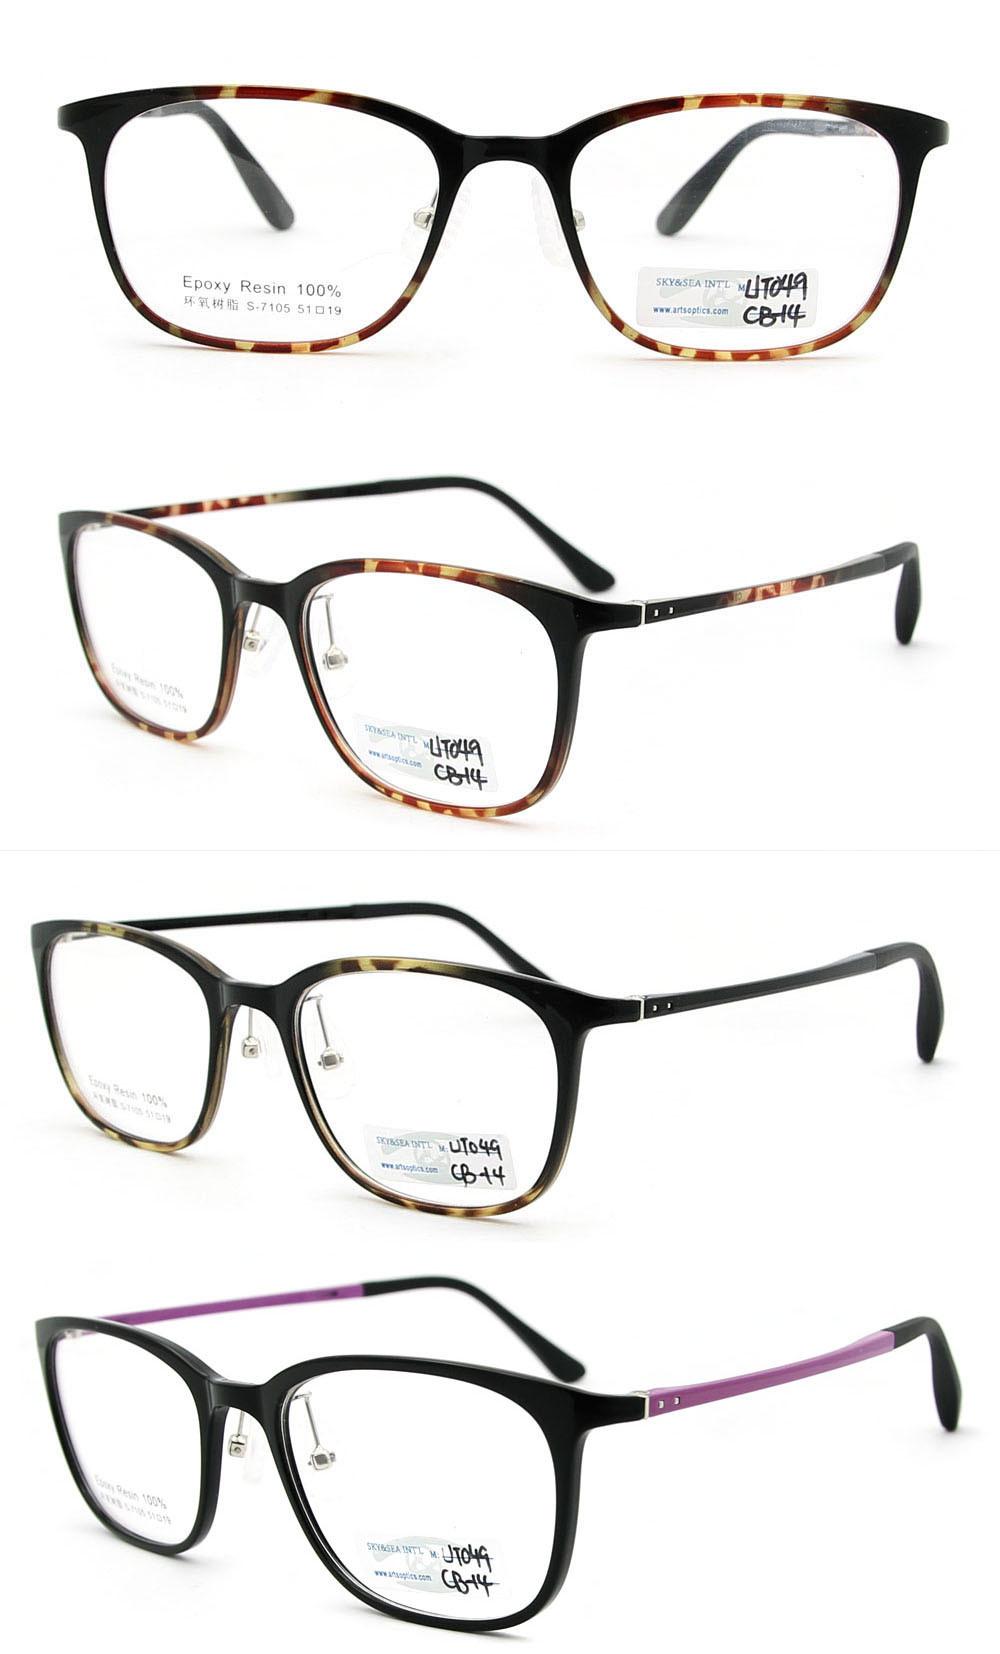 Updated Professional Ultem Optical Frames (UT049)